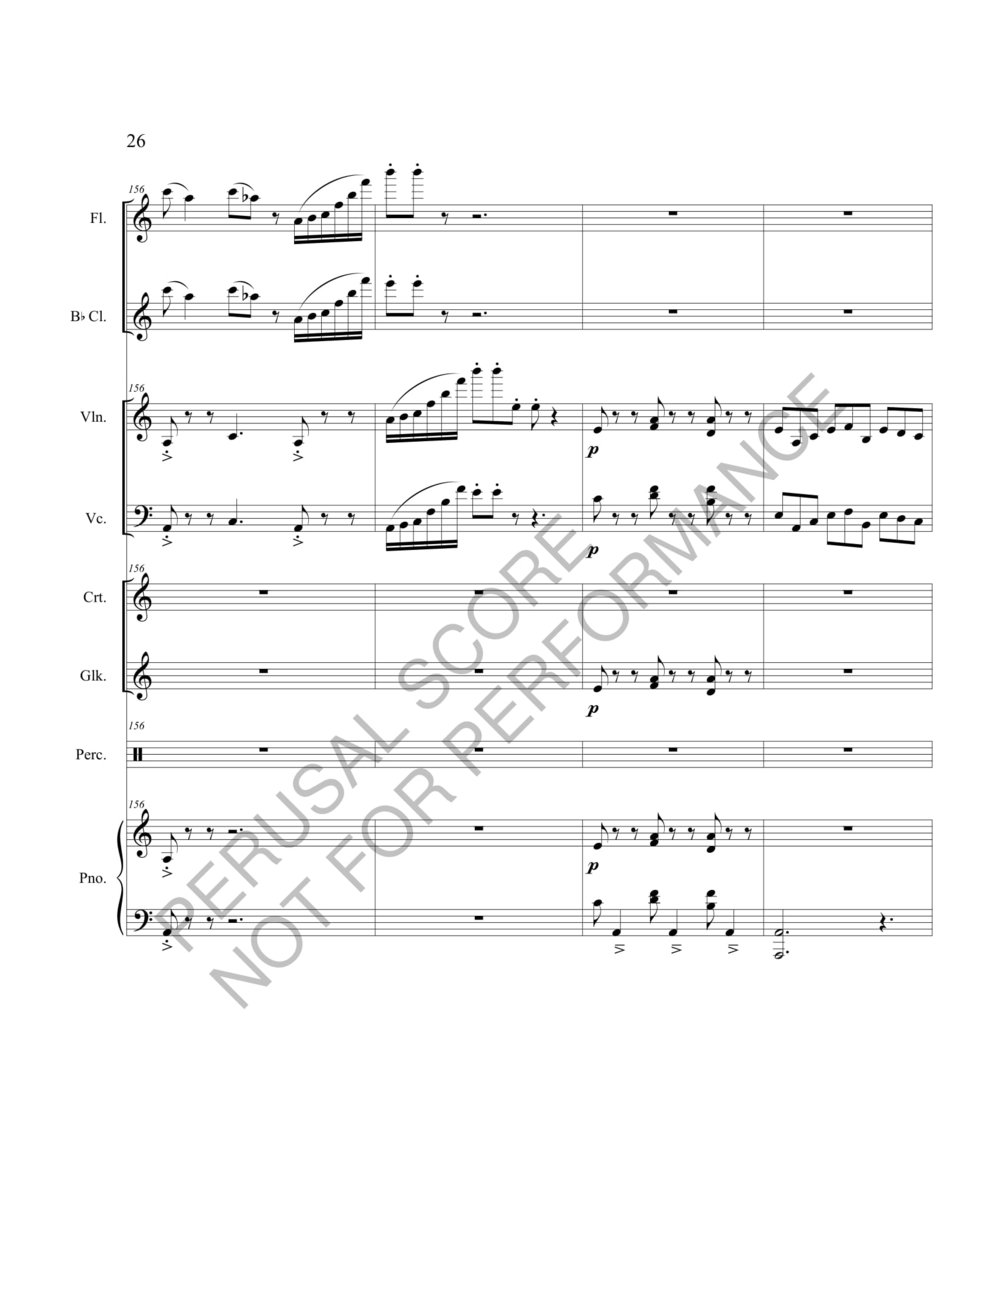 Boyd Terra Liberi Score-watermark-32.jpg